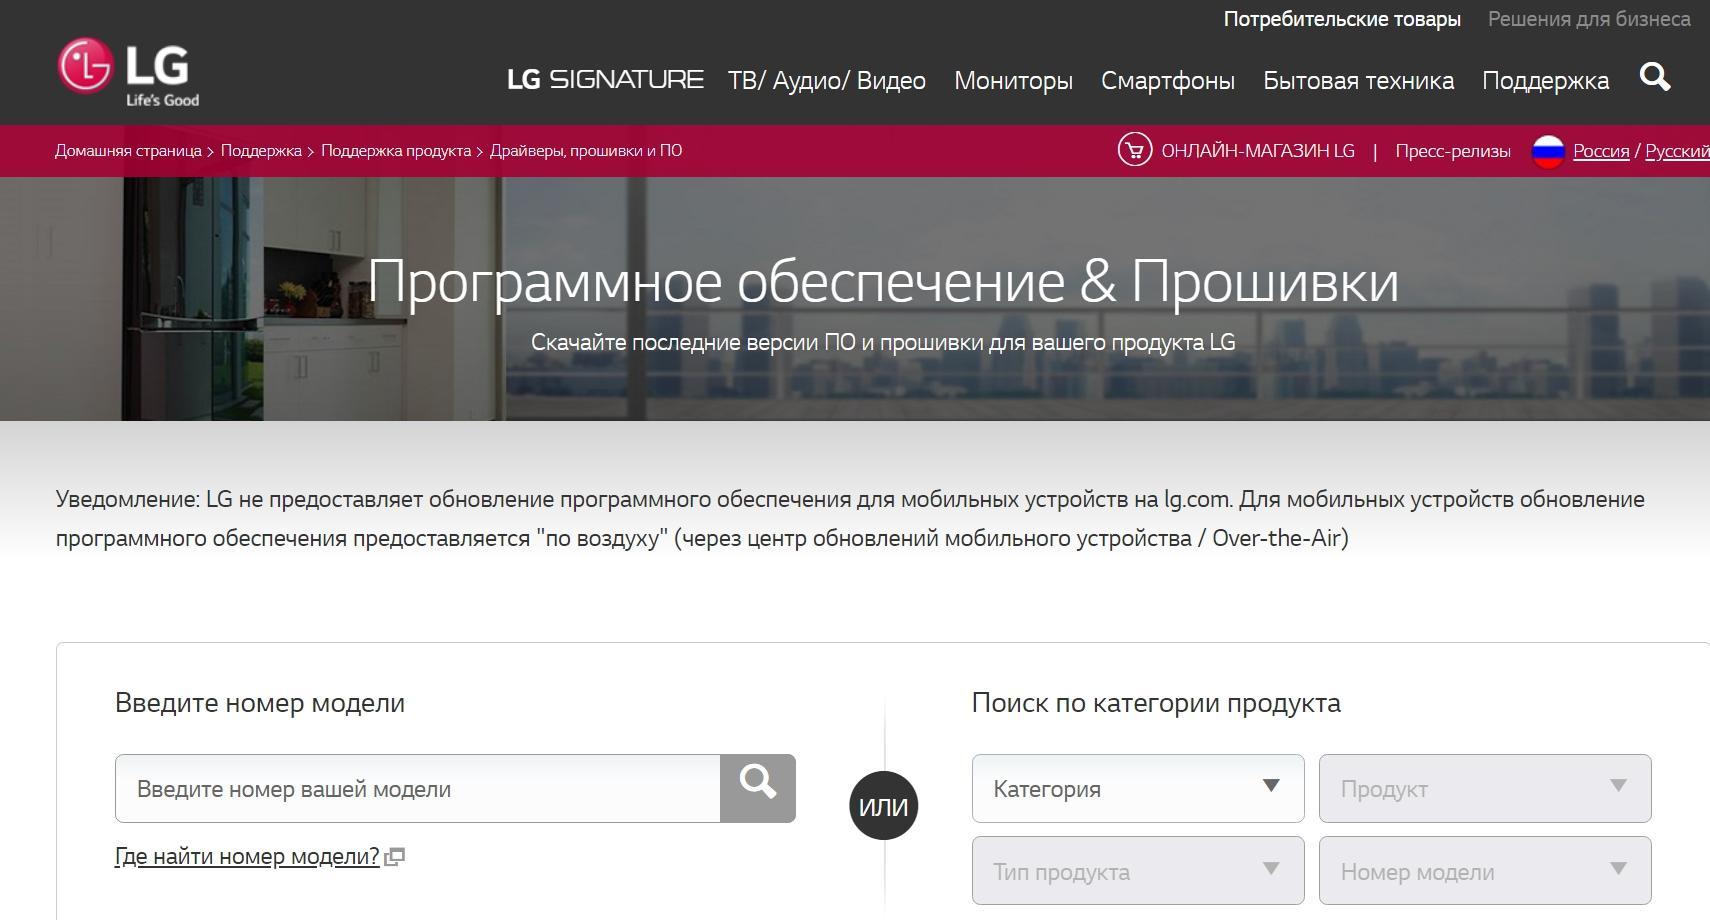 Сайт компании LG